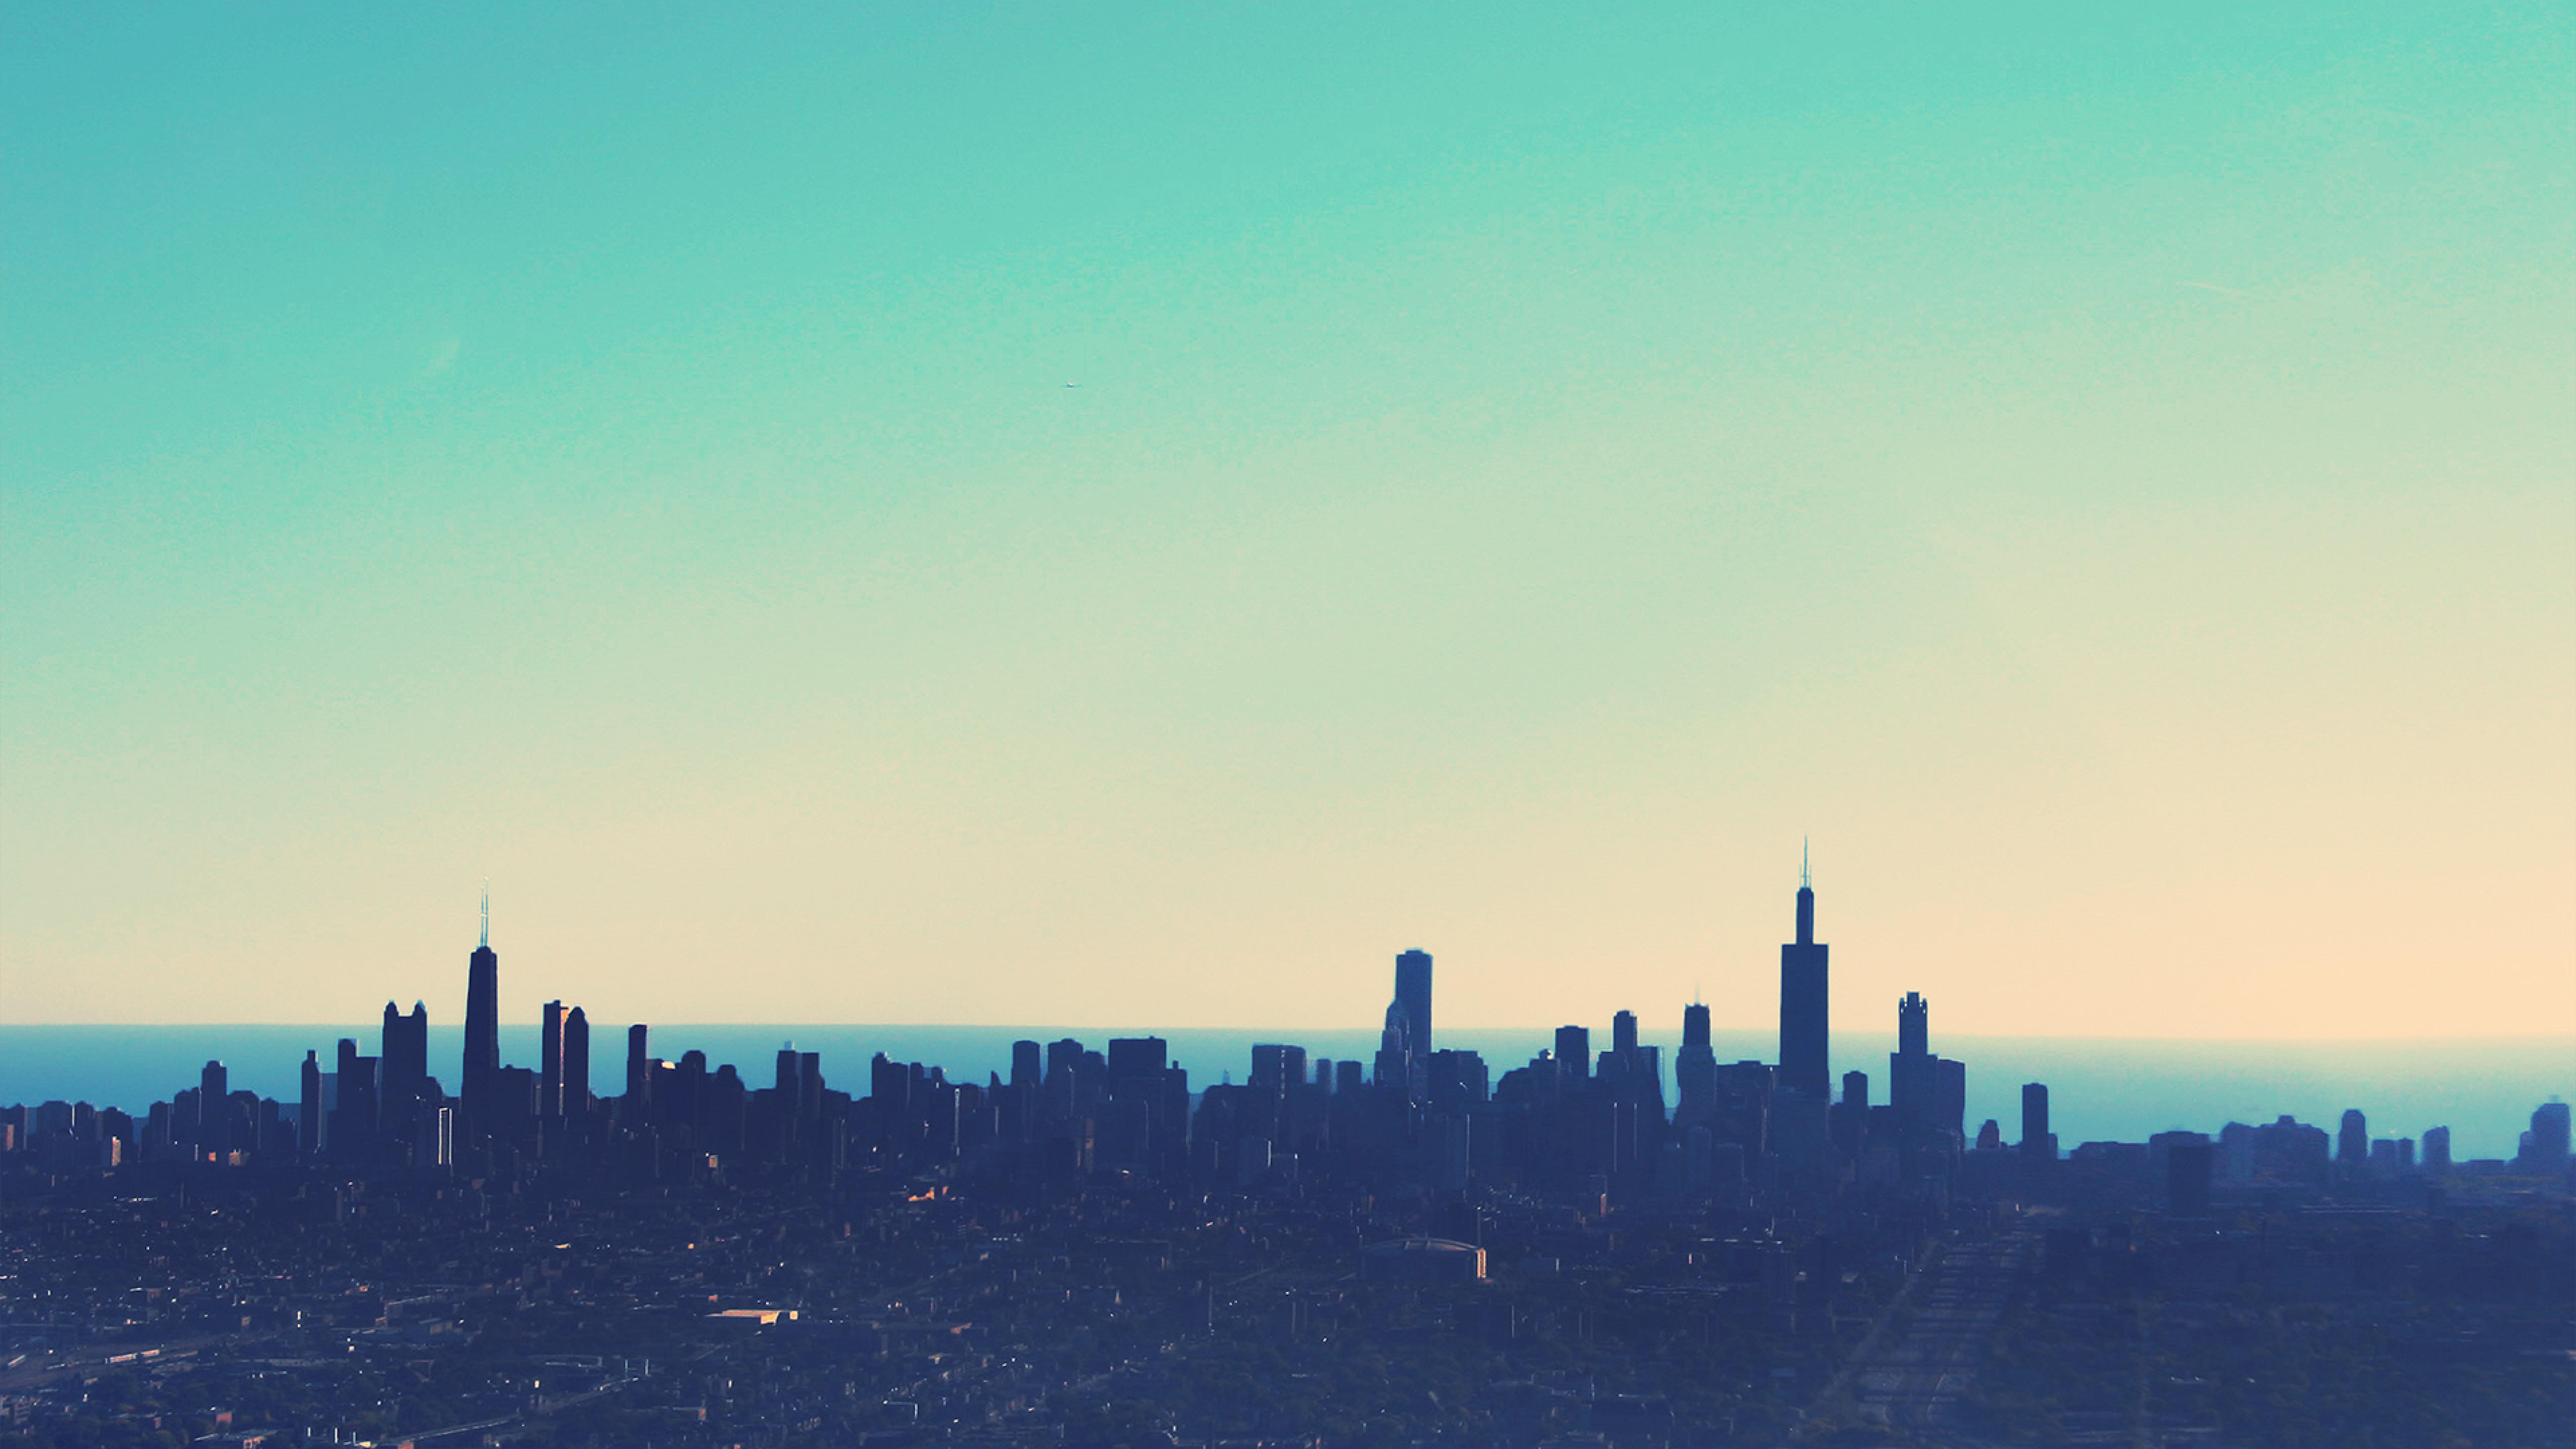 7680x4320 Chicago City Skyline 8k Wallpaper Hd City 4k Wallpapers